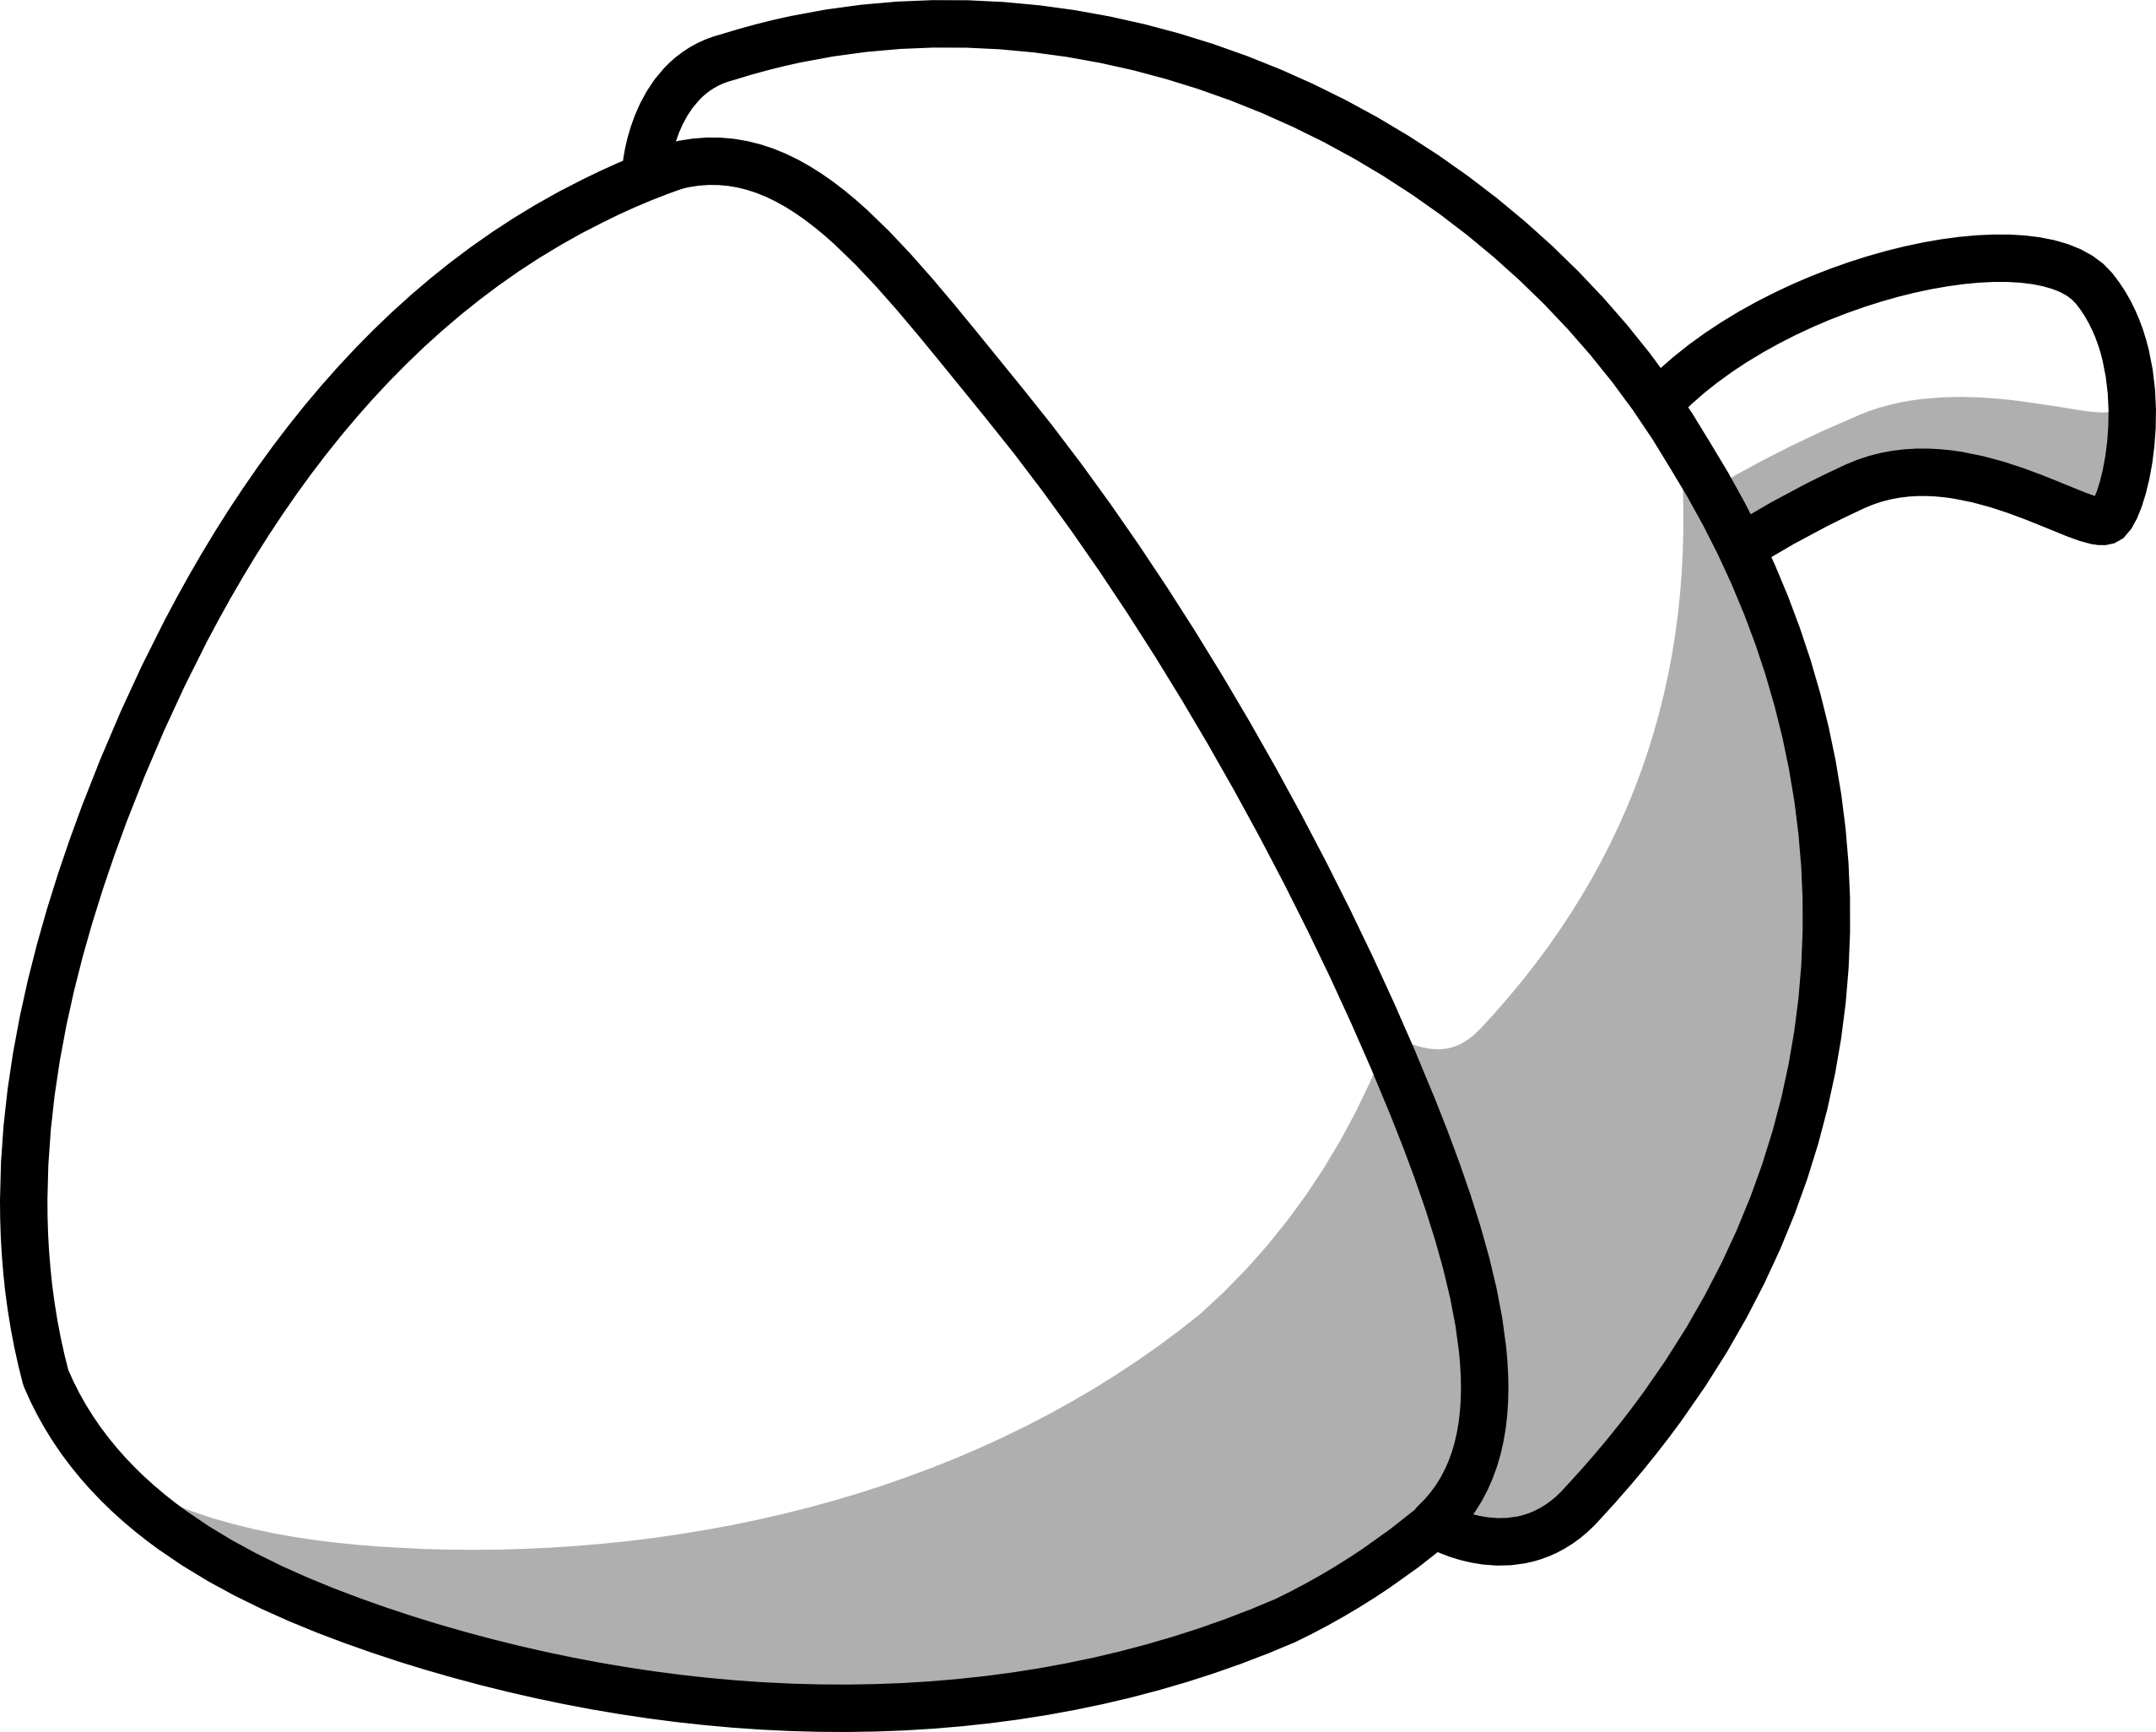 2555x2052 Acorn Clipart Black And White